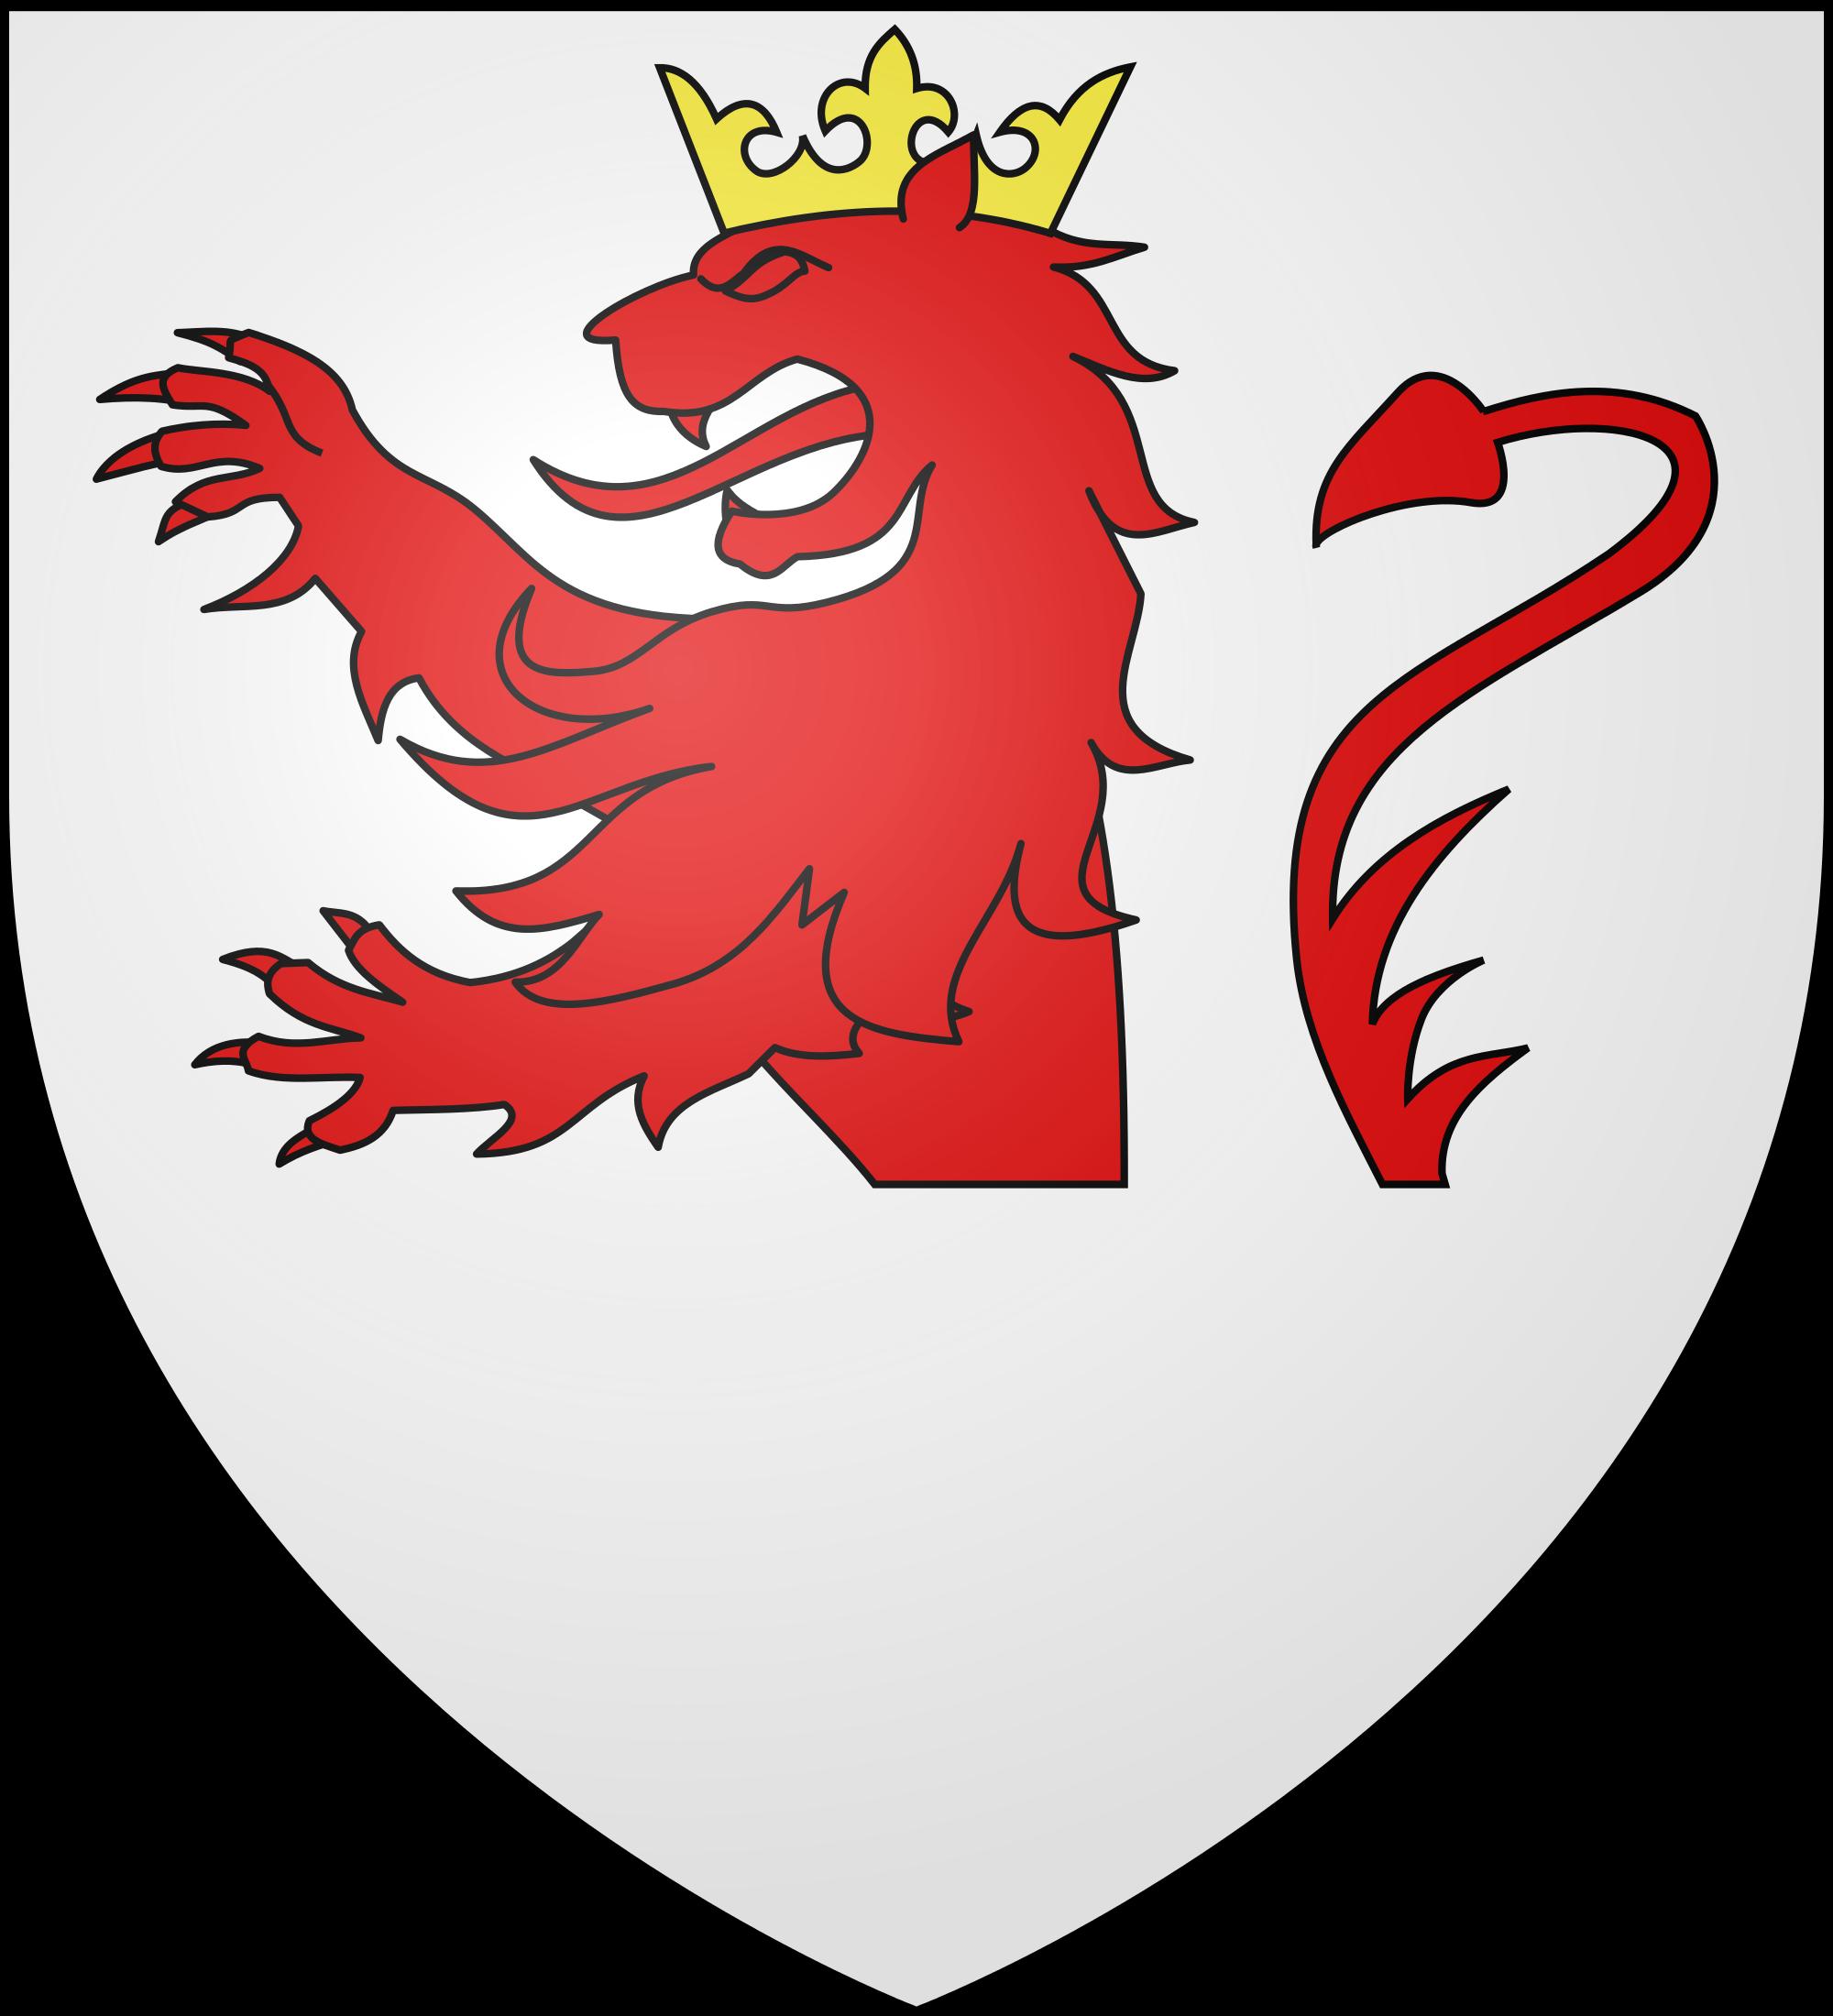 File:Blason ville be Dinant (Namur).svg.